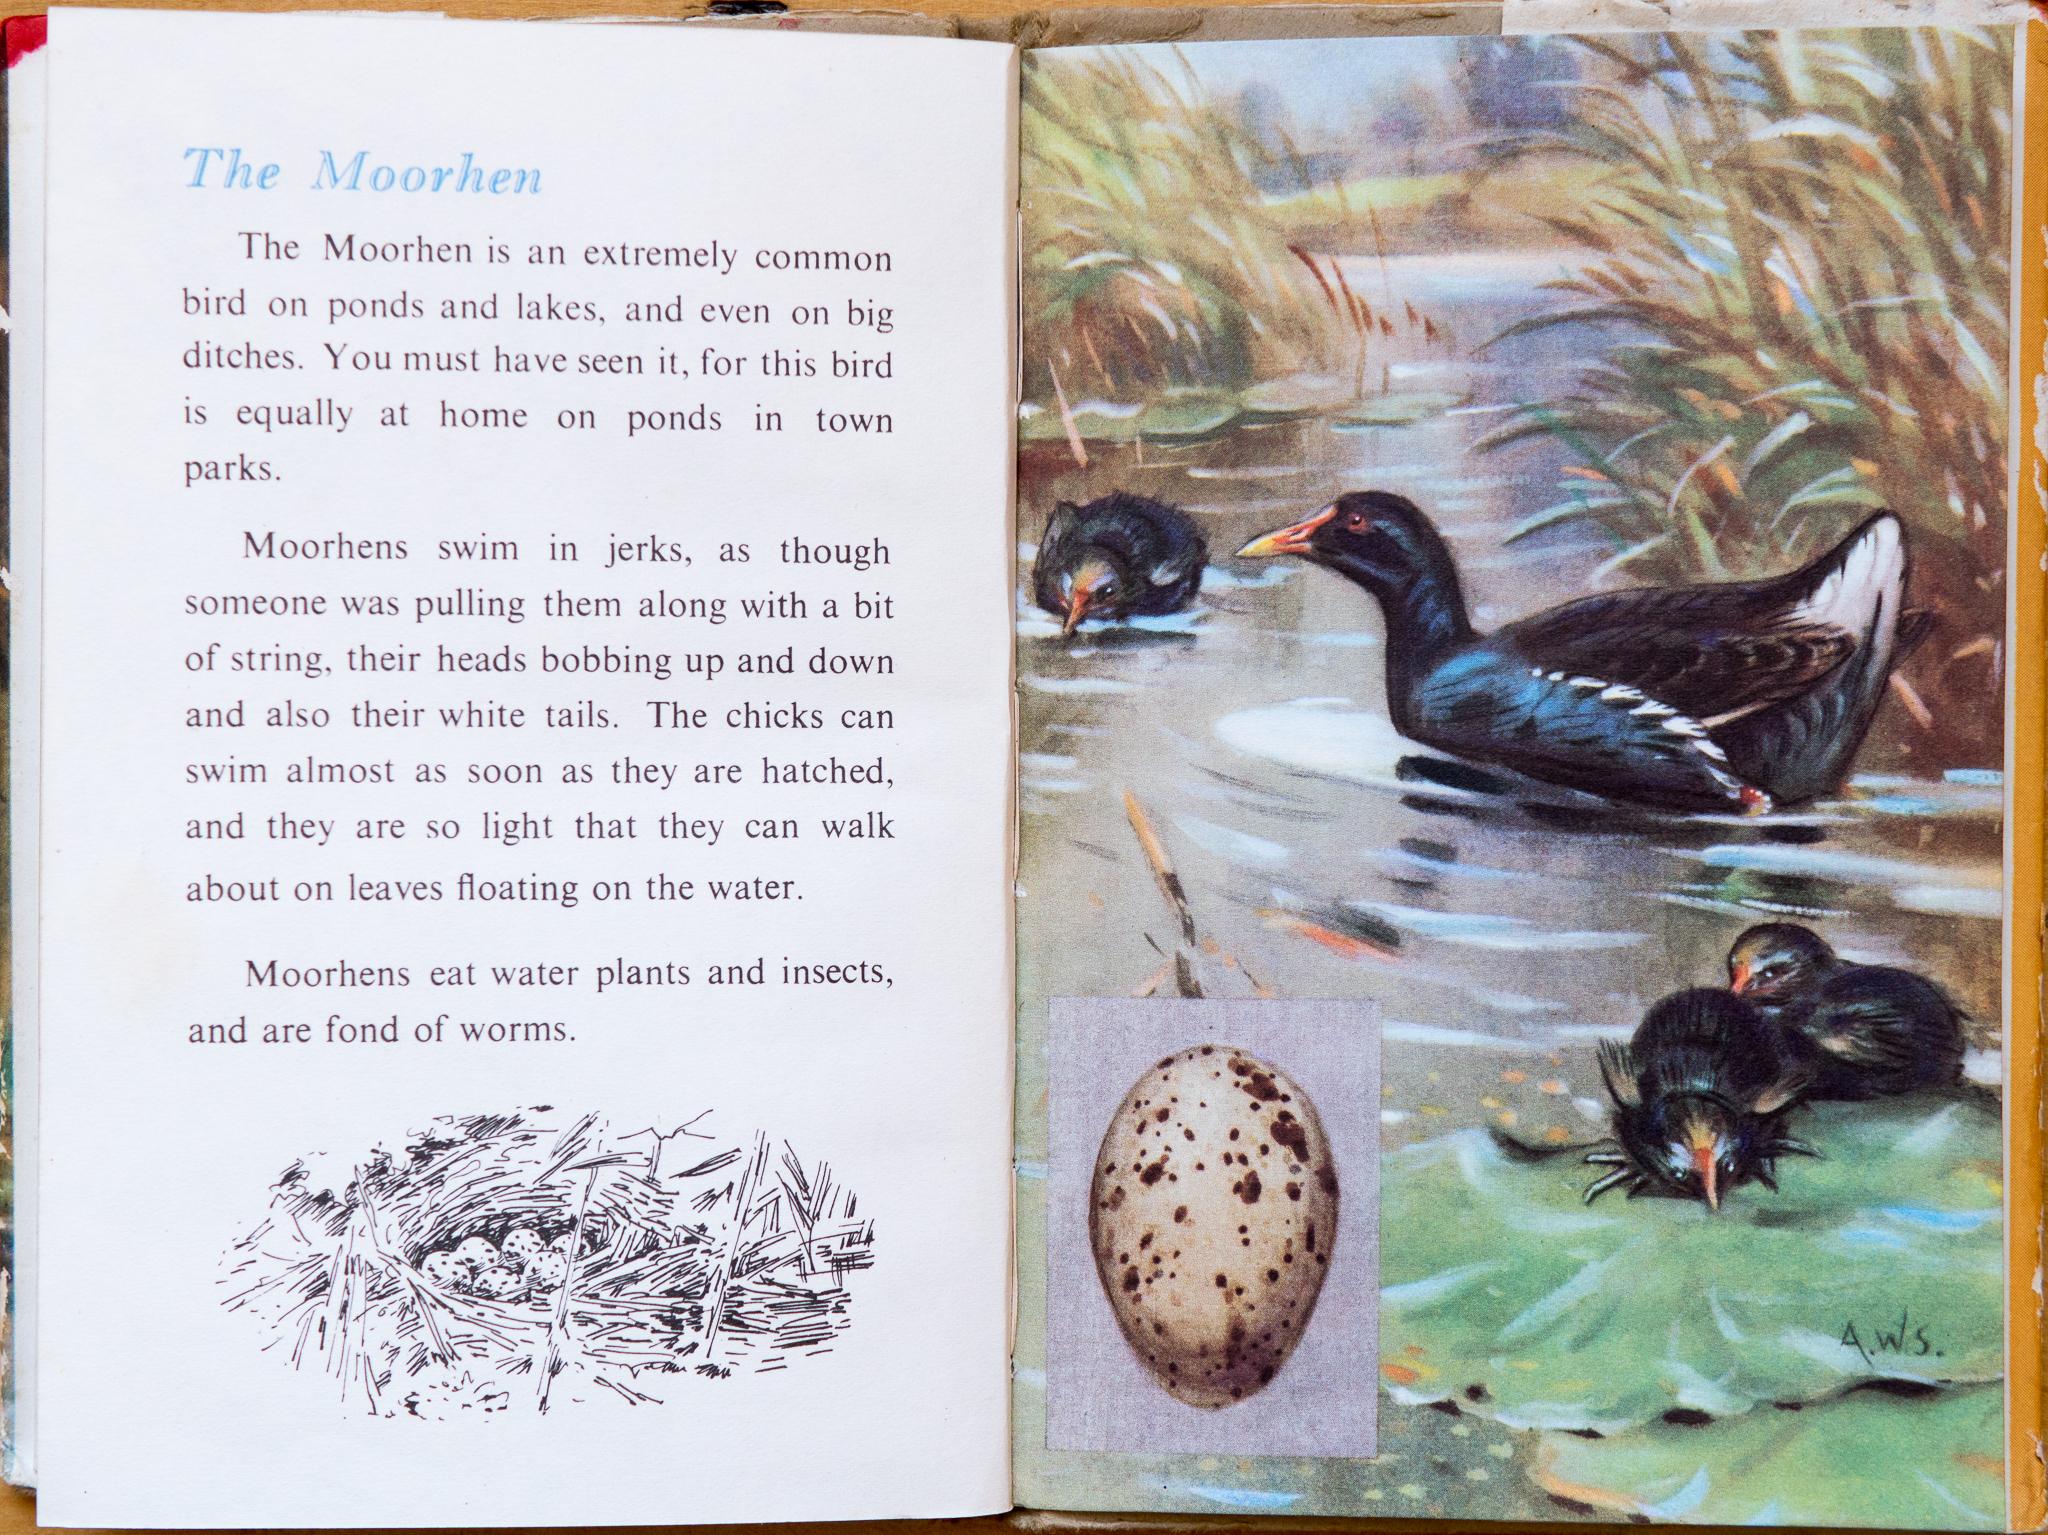 Ladybird Book of British Birds - The Hall of Einar